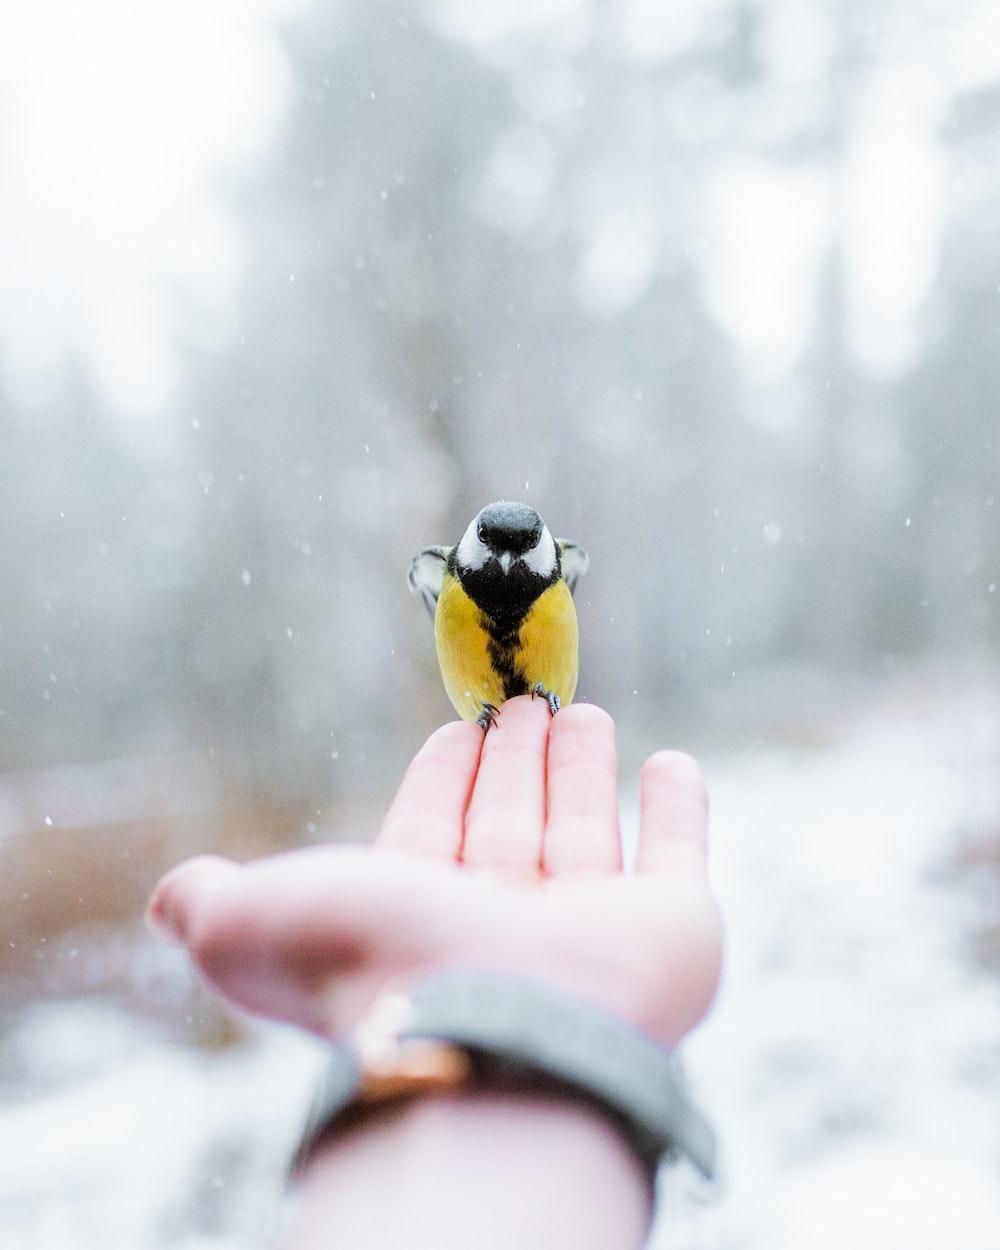 black and yellow bird